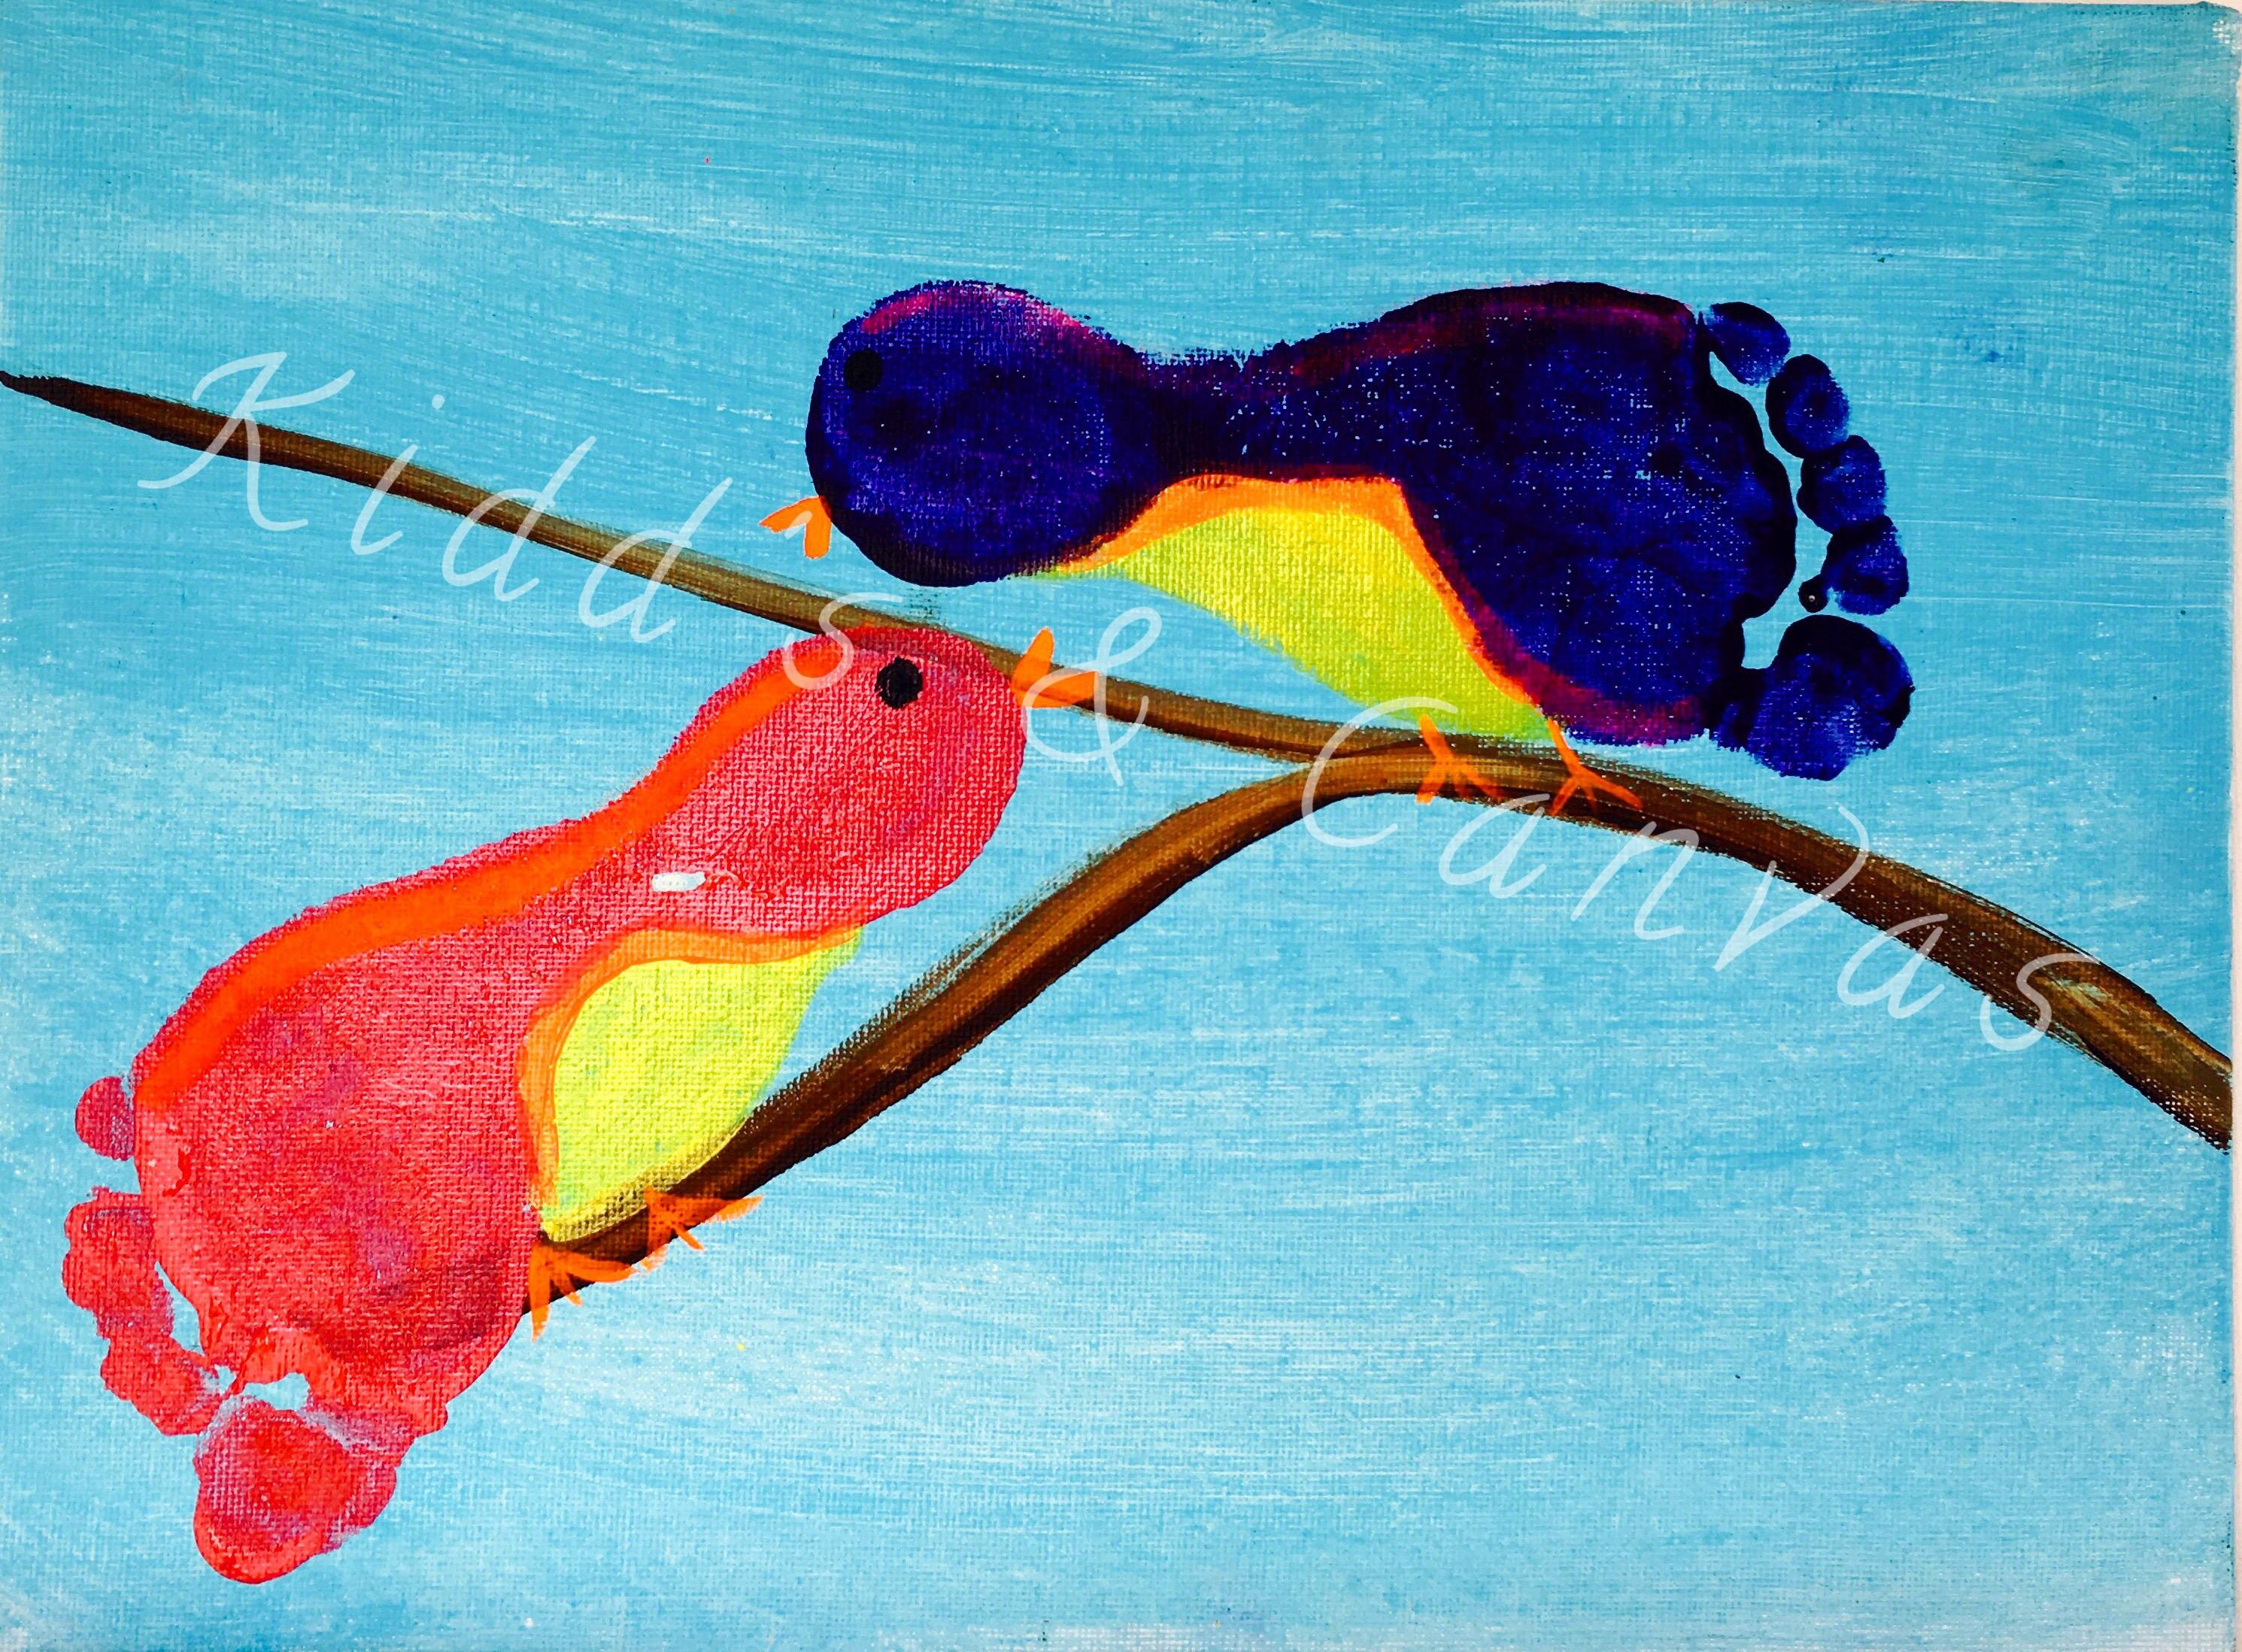 Birds on a Branch Footprint